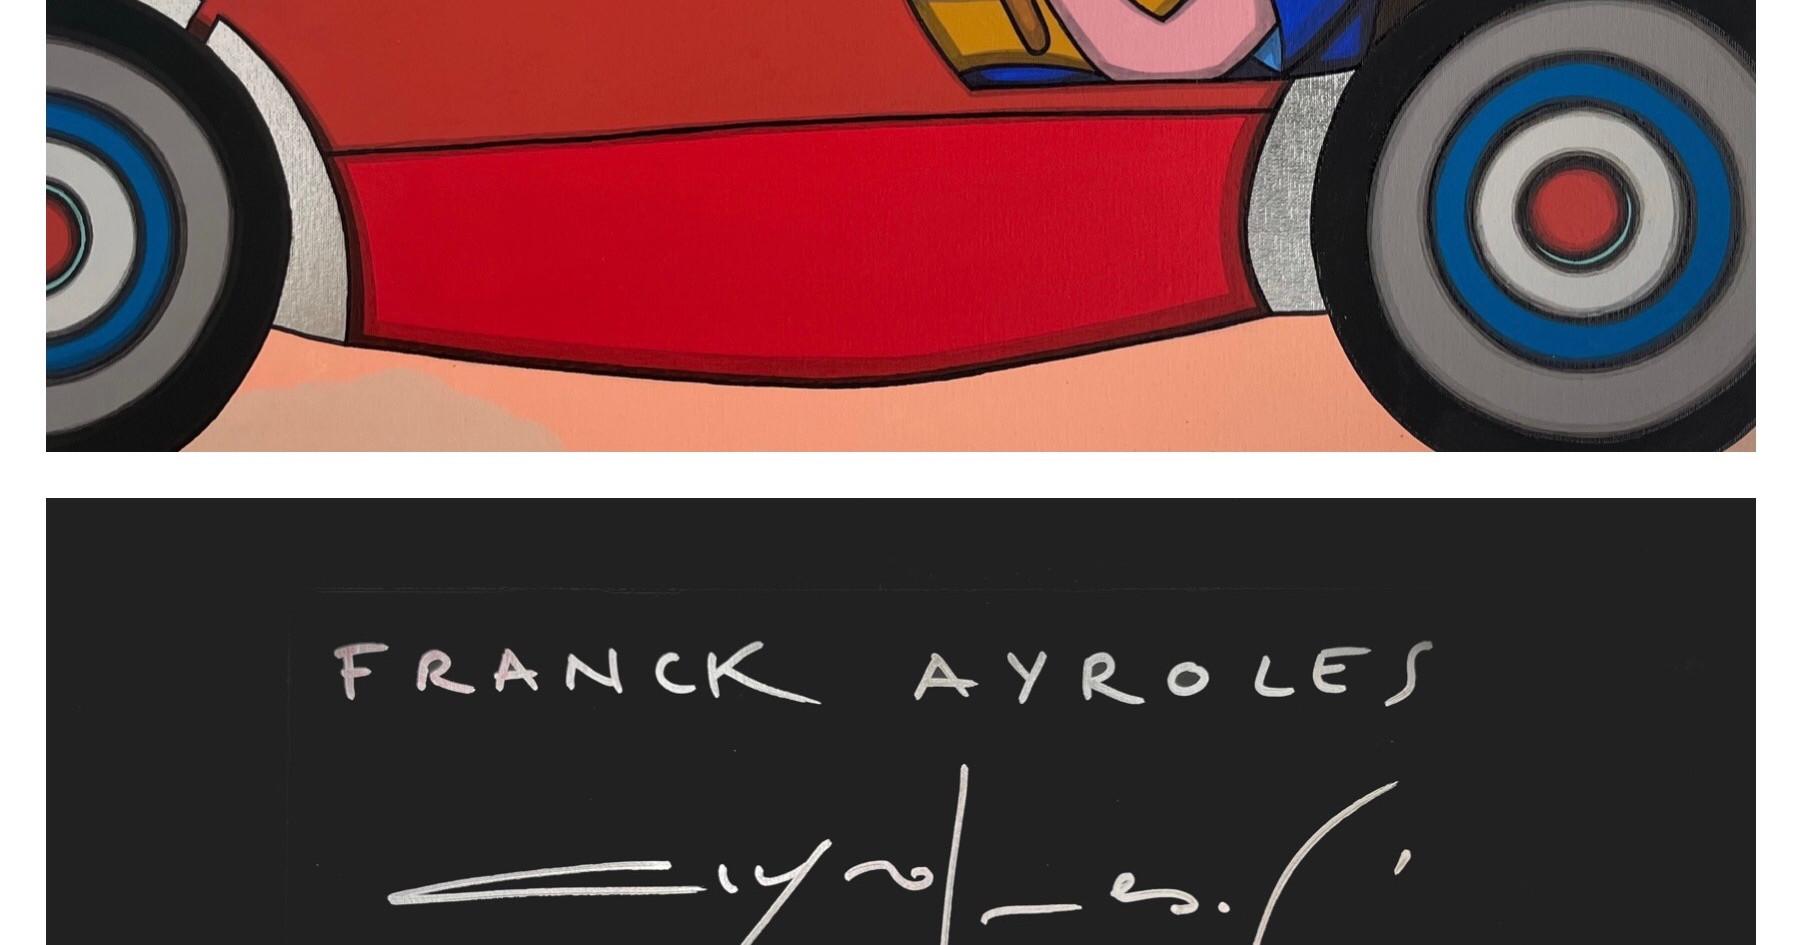 Franck AYROLES